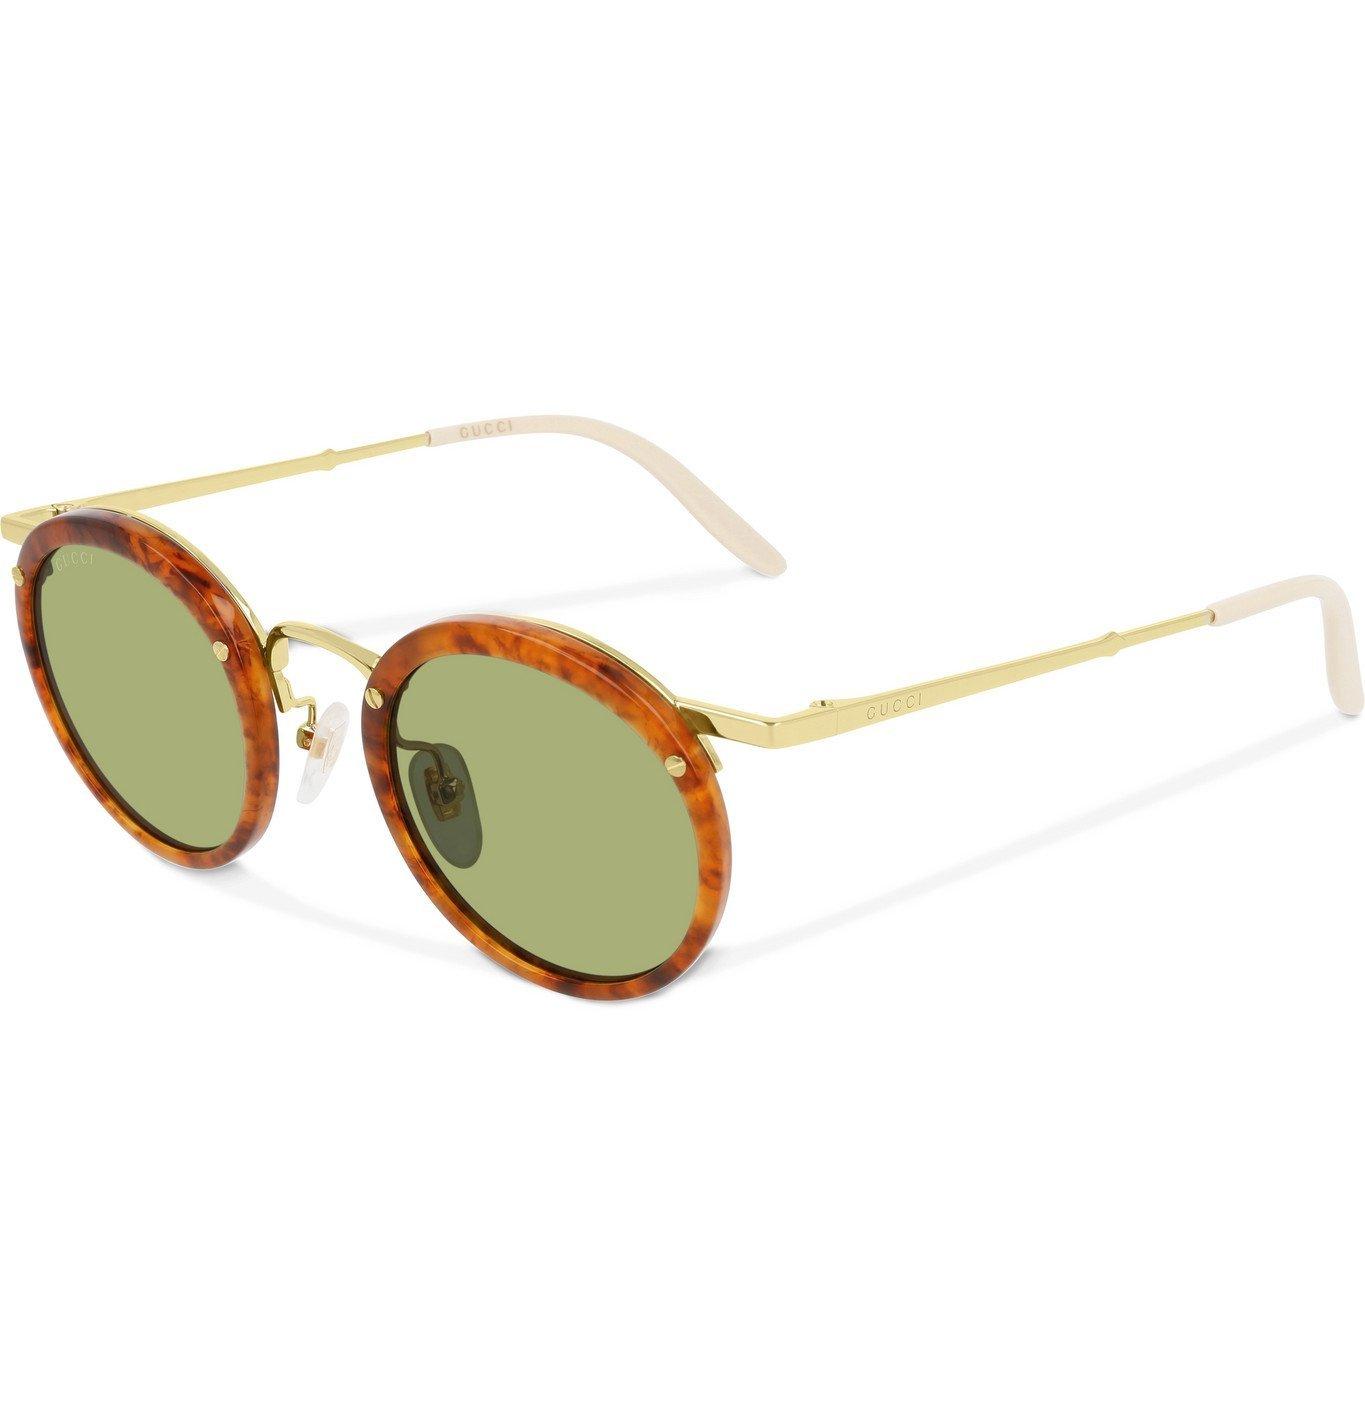 Photo: Gucci - Round-Frame Tortoiseshell Acetate and Gold-Tone Sunglasses - Tortoiseshell